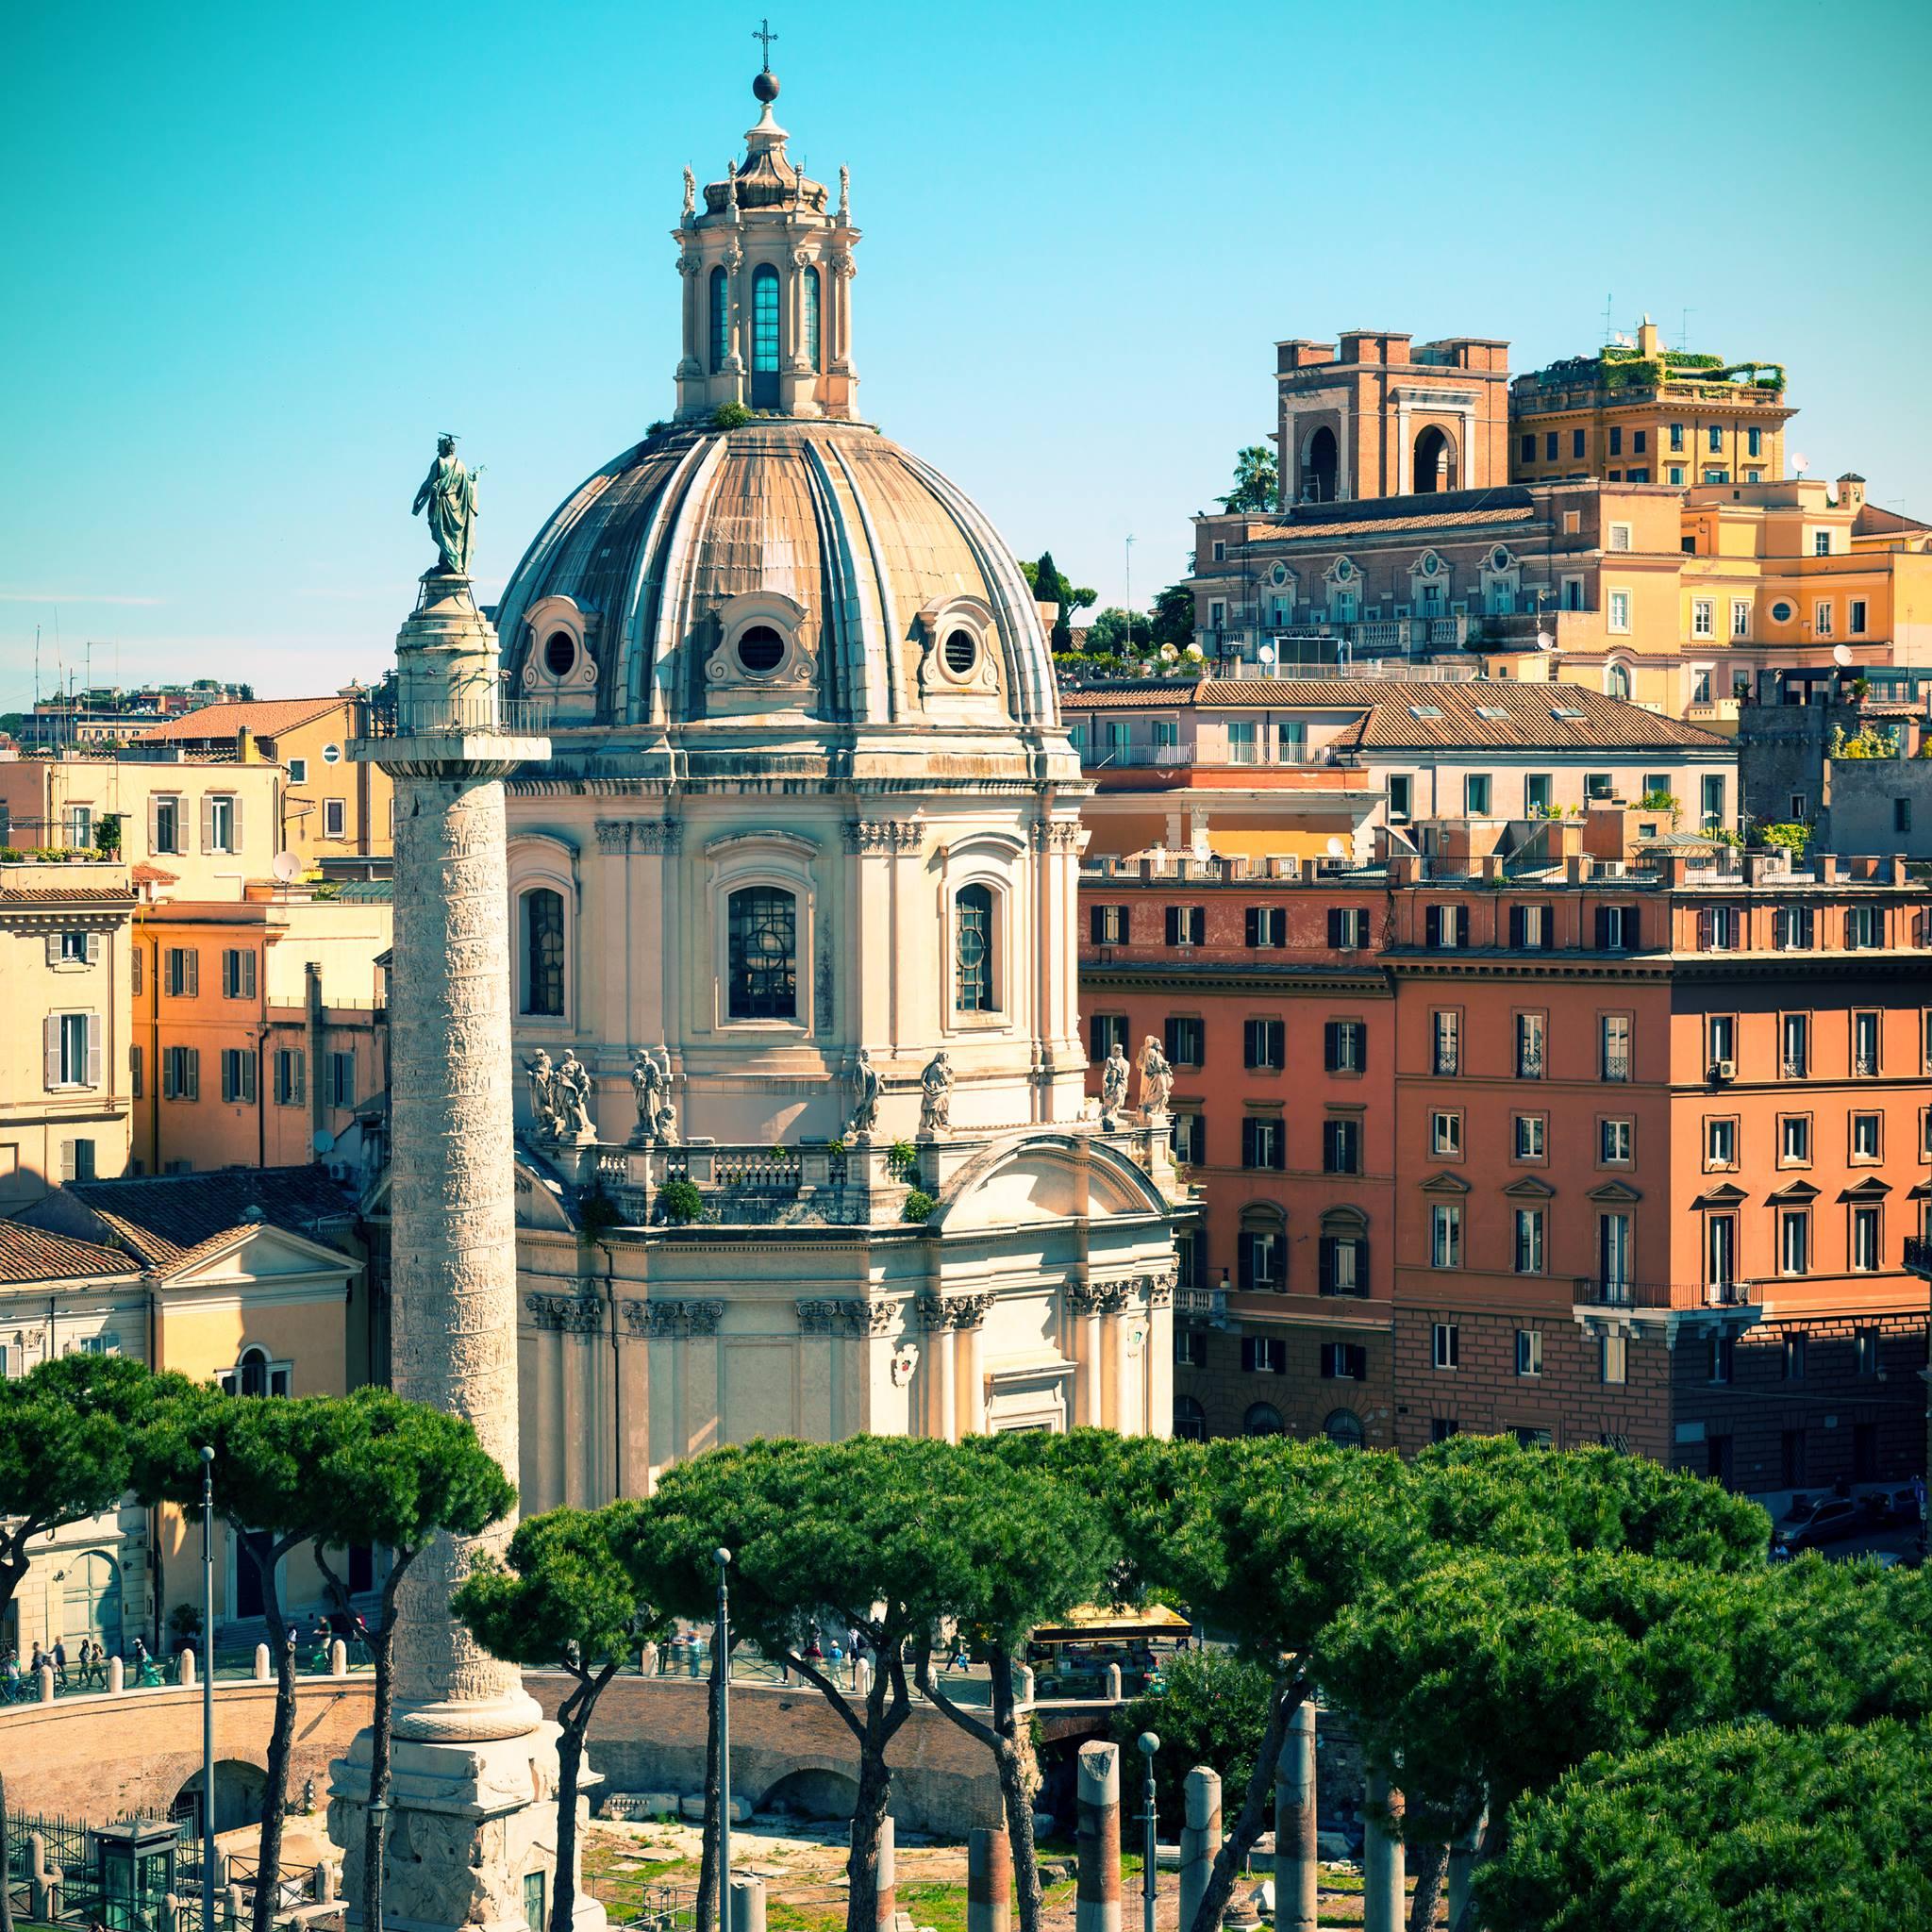 Roma Traian